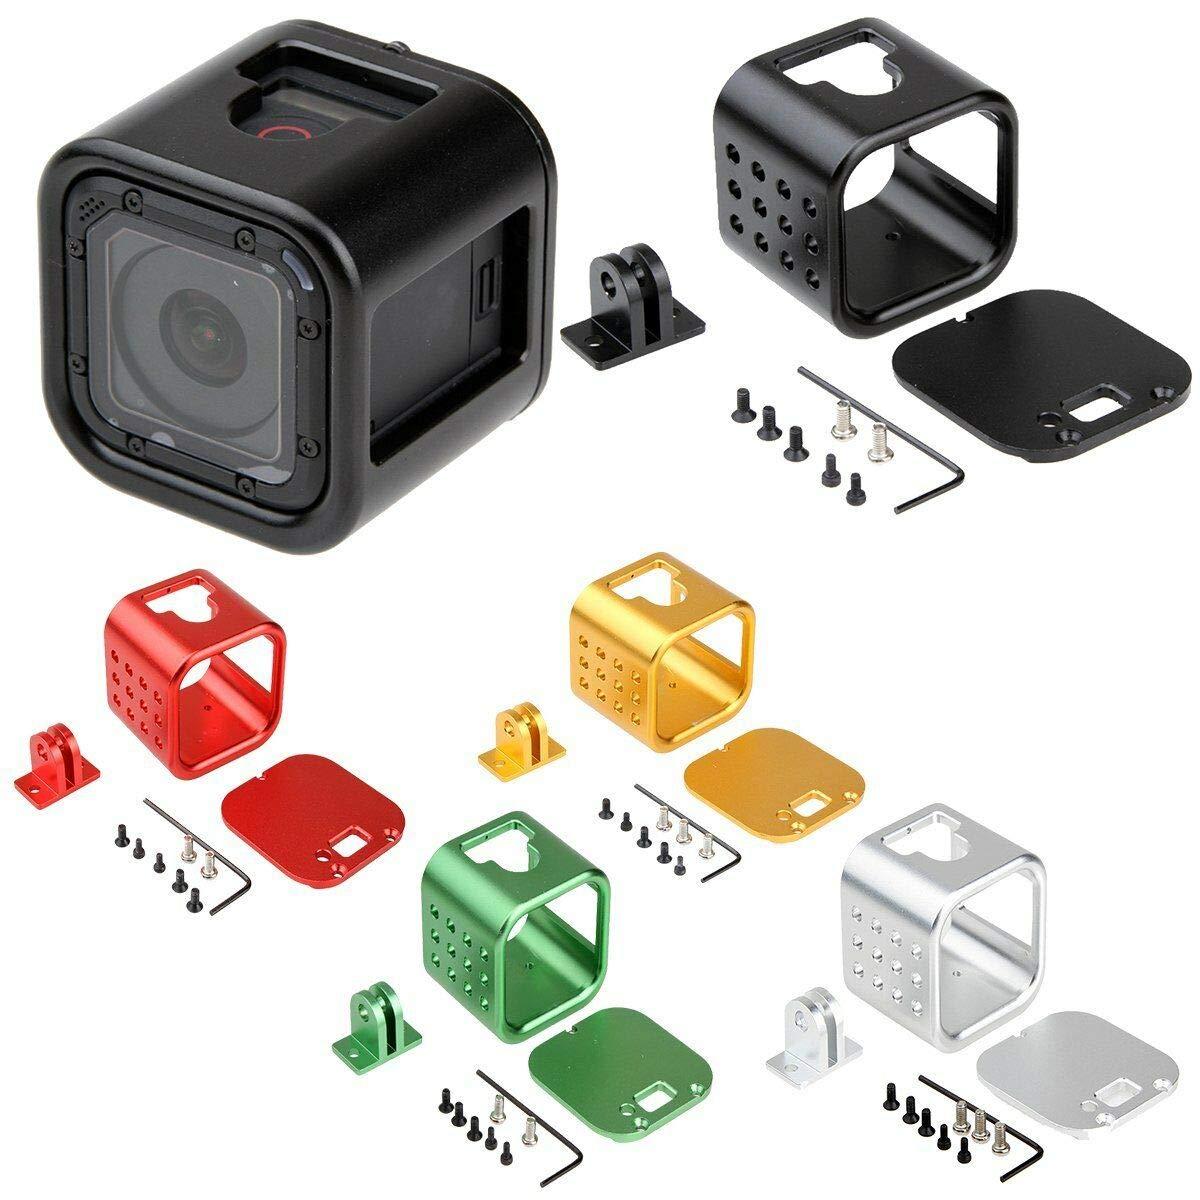 Studyset CNC Carcasa Protectora de Aluminio para GoPro Hero 4 5 Session